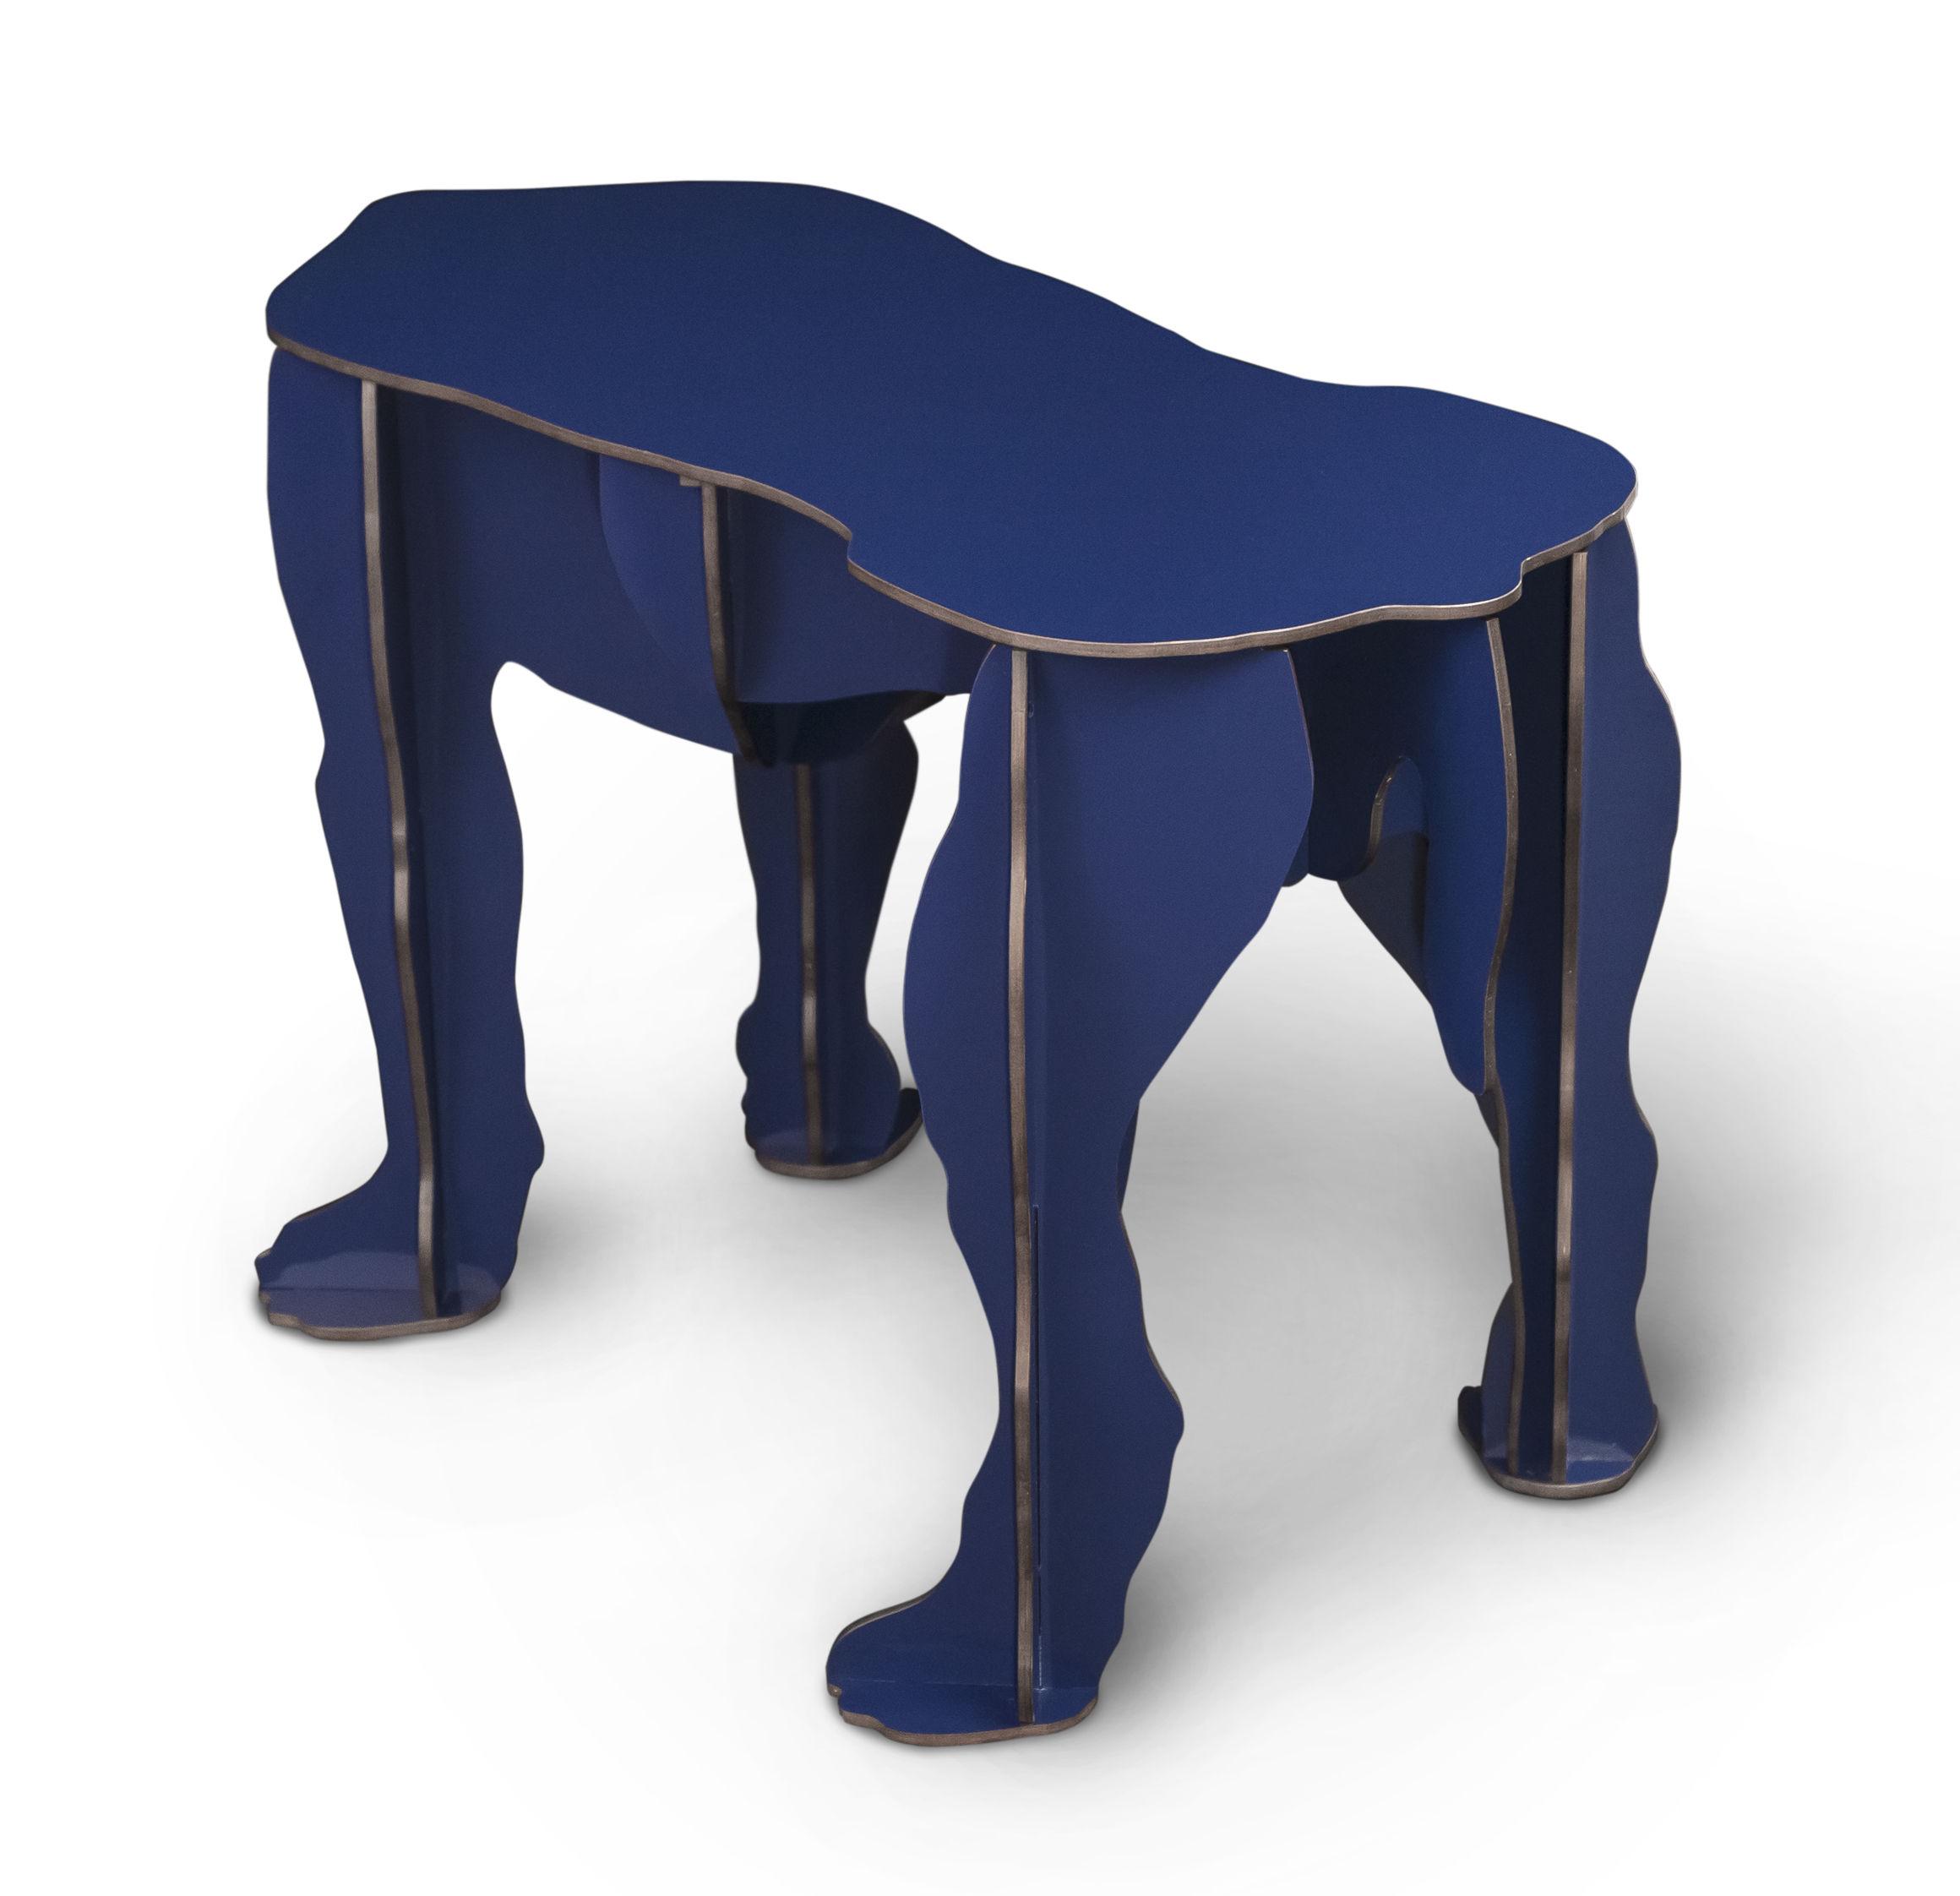 banc rex table basse plastique bleu brillant ibride. Black Bedroom Furniture Sets. Home Design Ideas